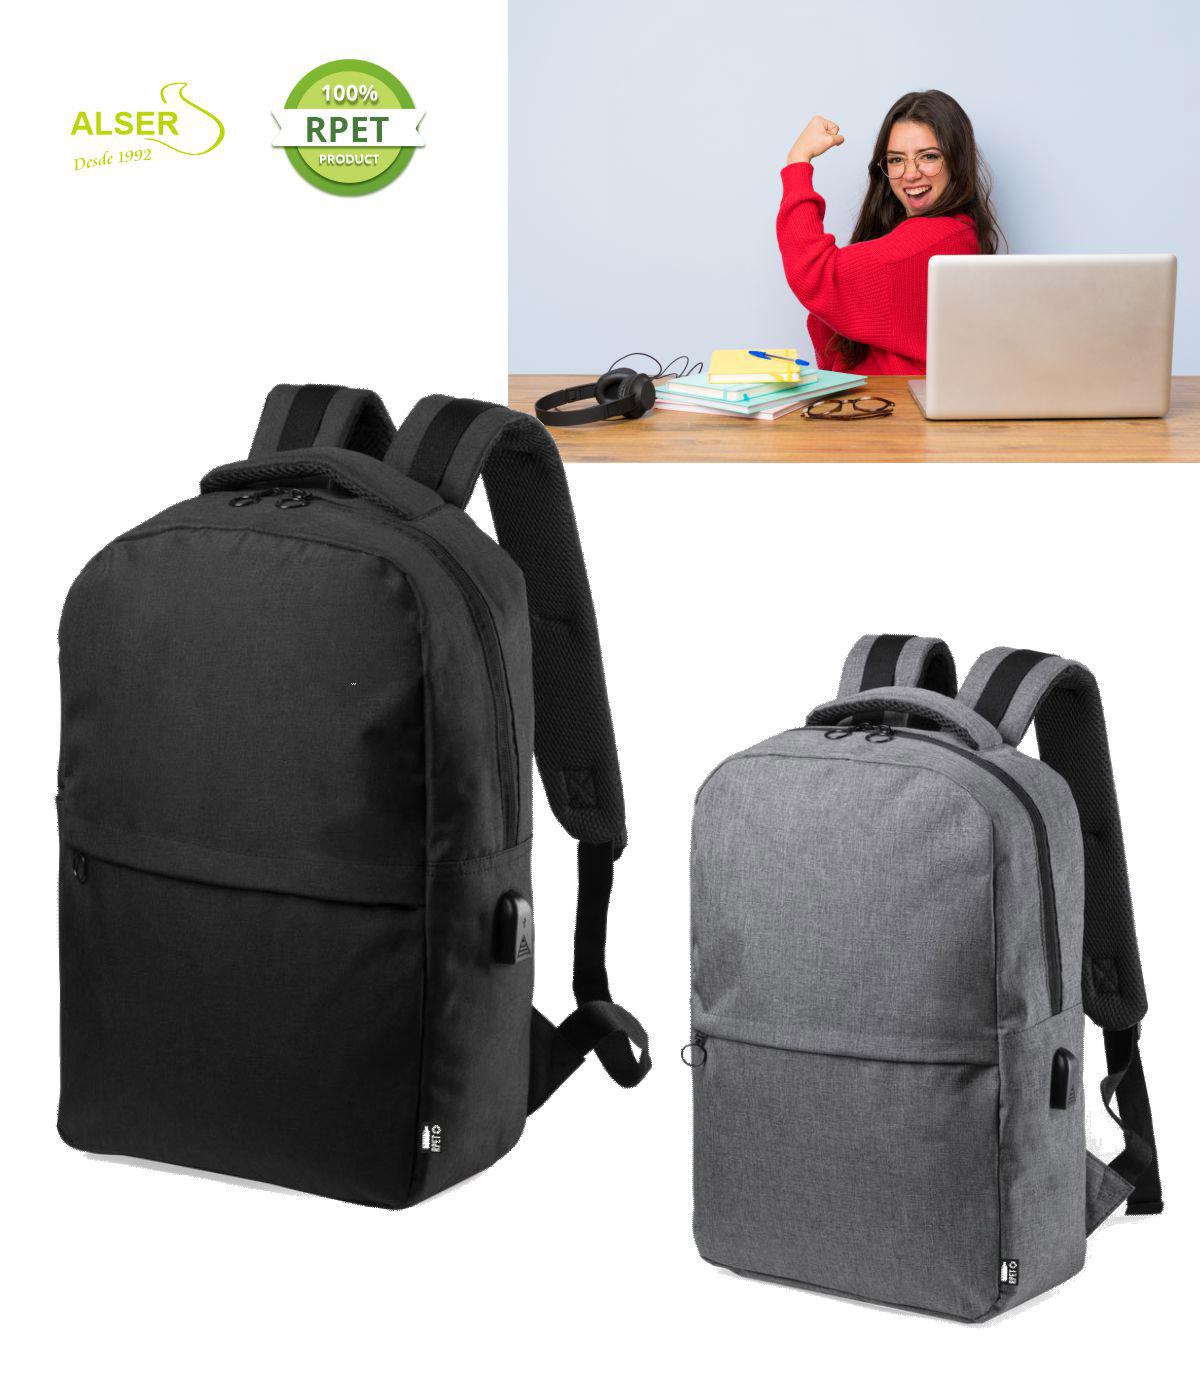 Mochila Laptop Corporativa Gris y negra